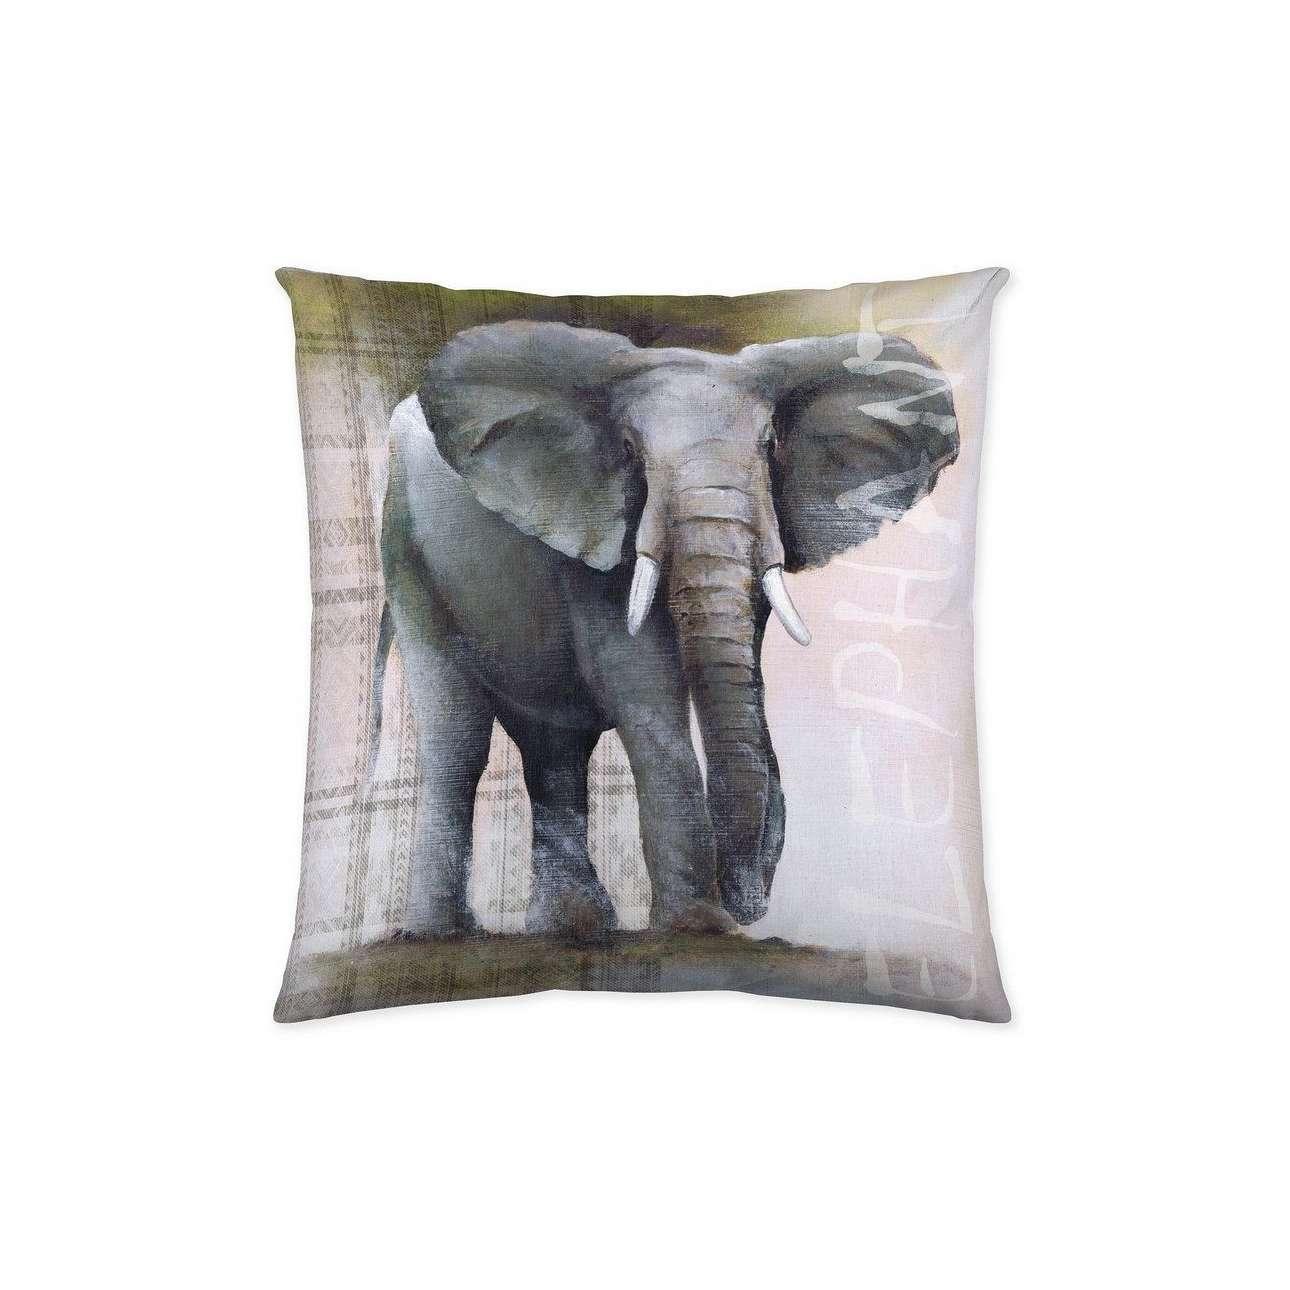 Kussenhoes Elephant 45x45cm